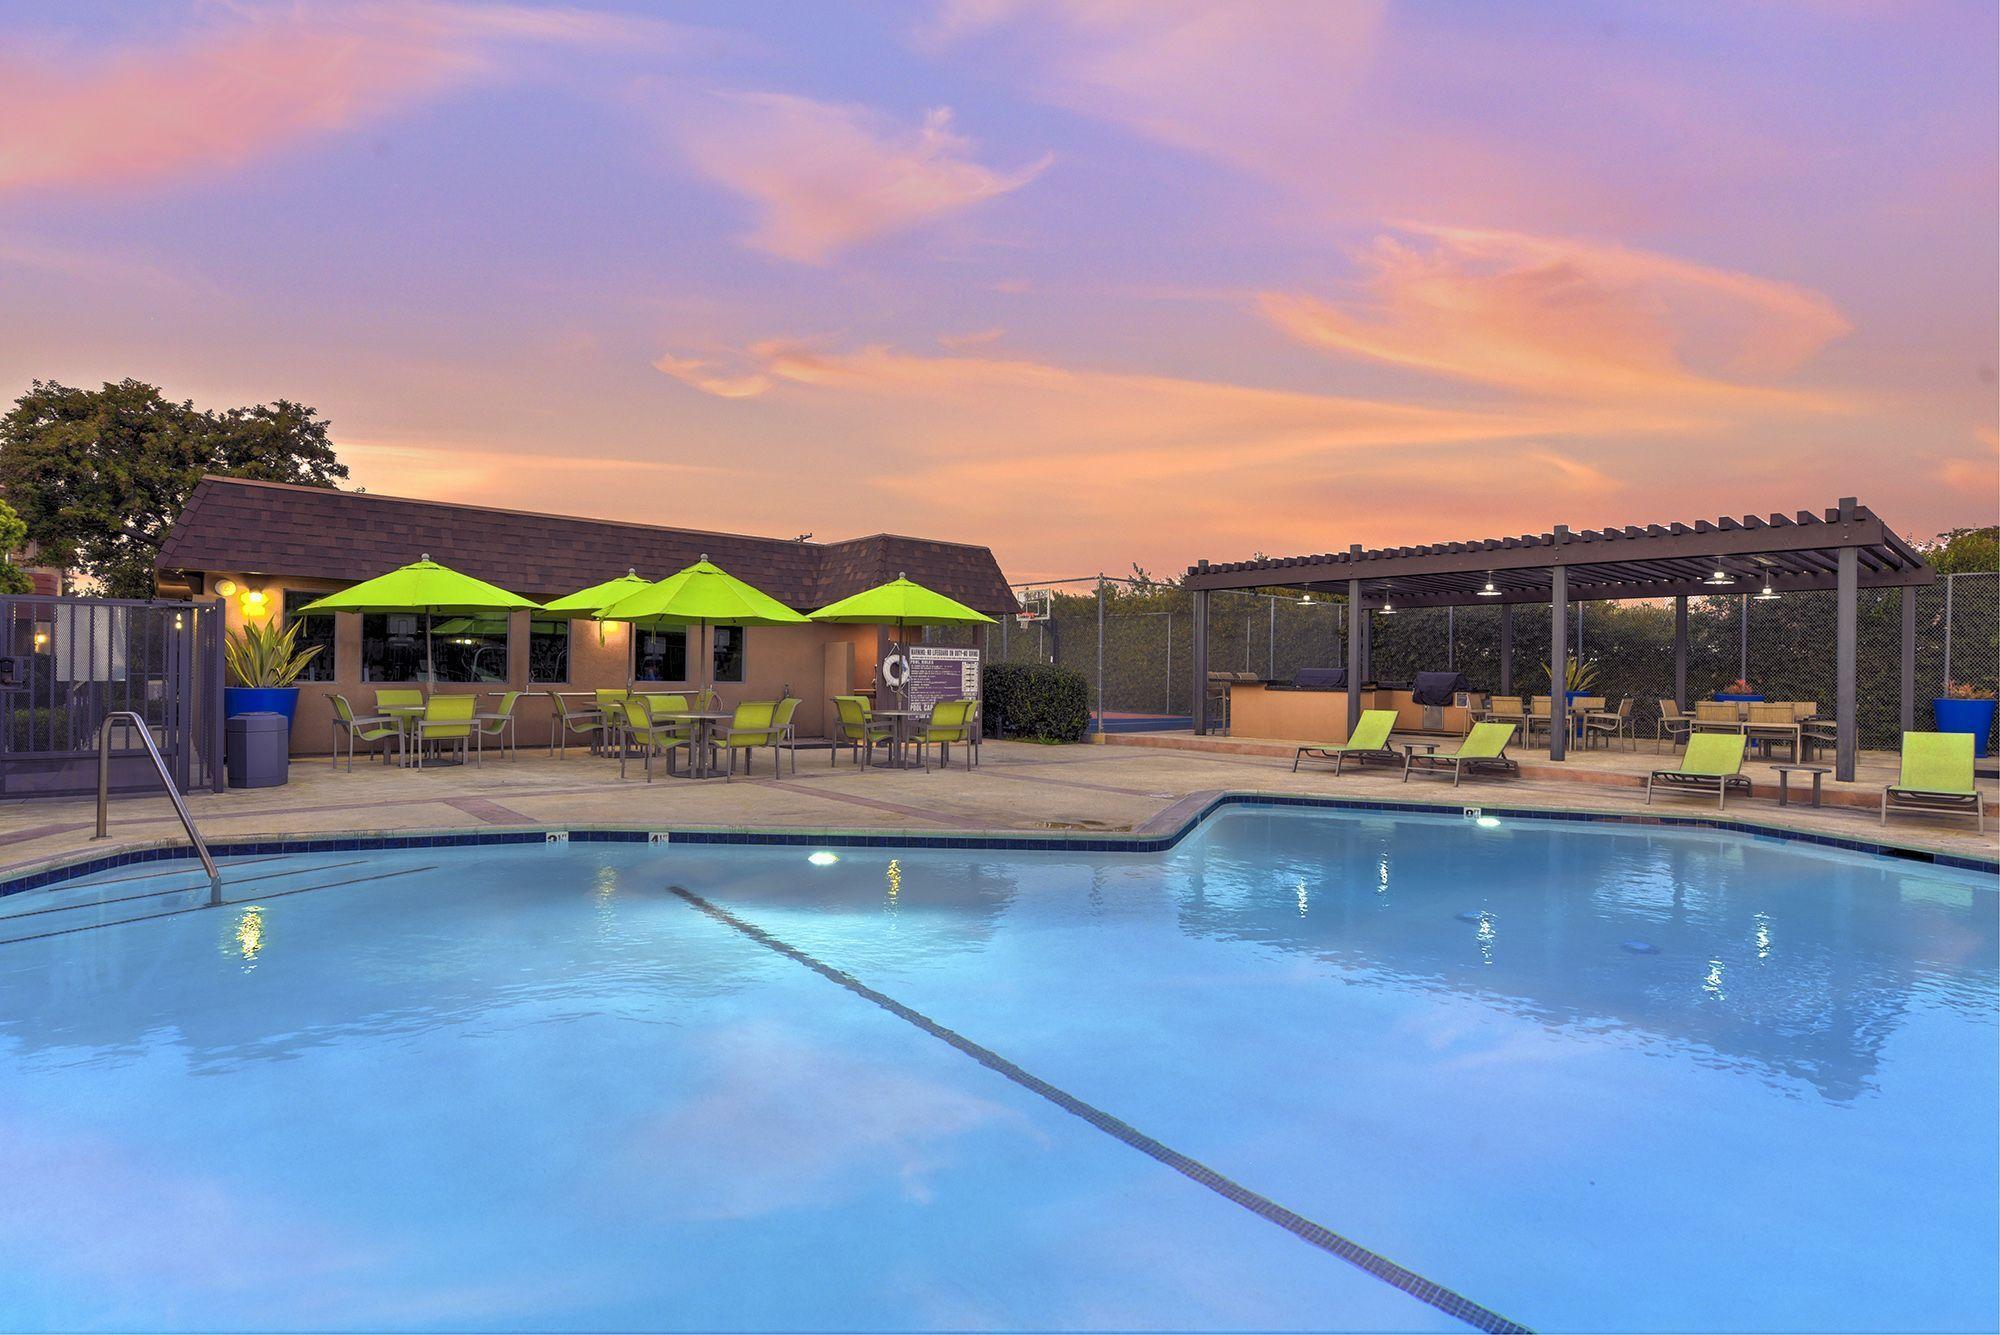 150 S Magnolia Ave, Anaheim, CA - $1,895 USD/ month